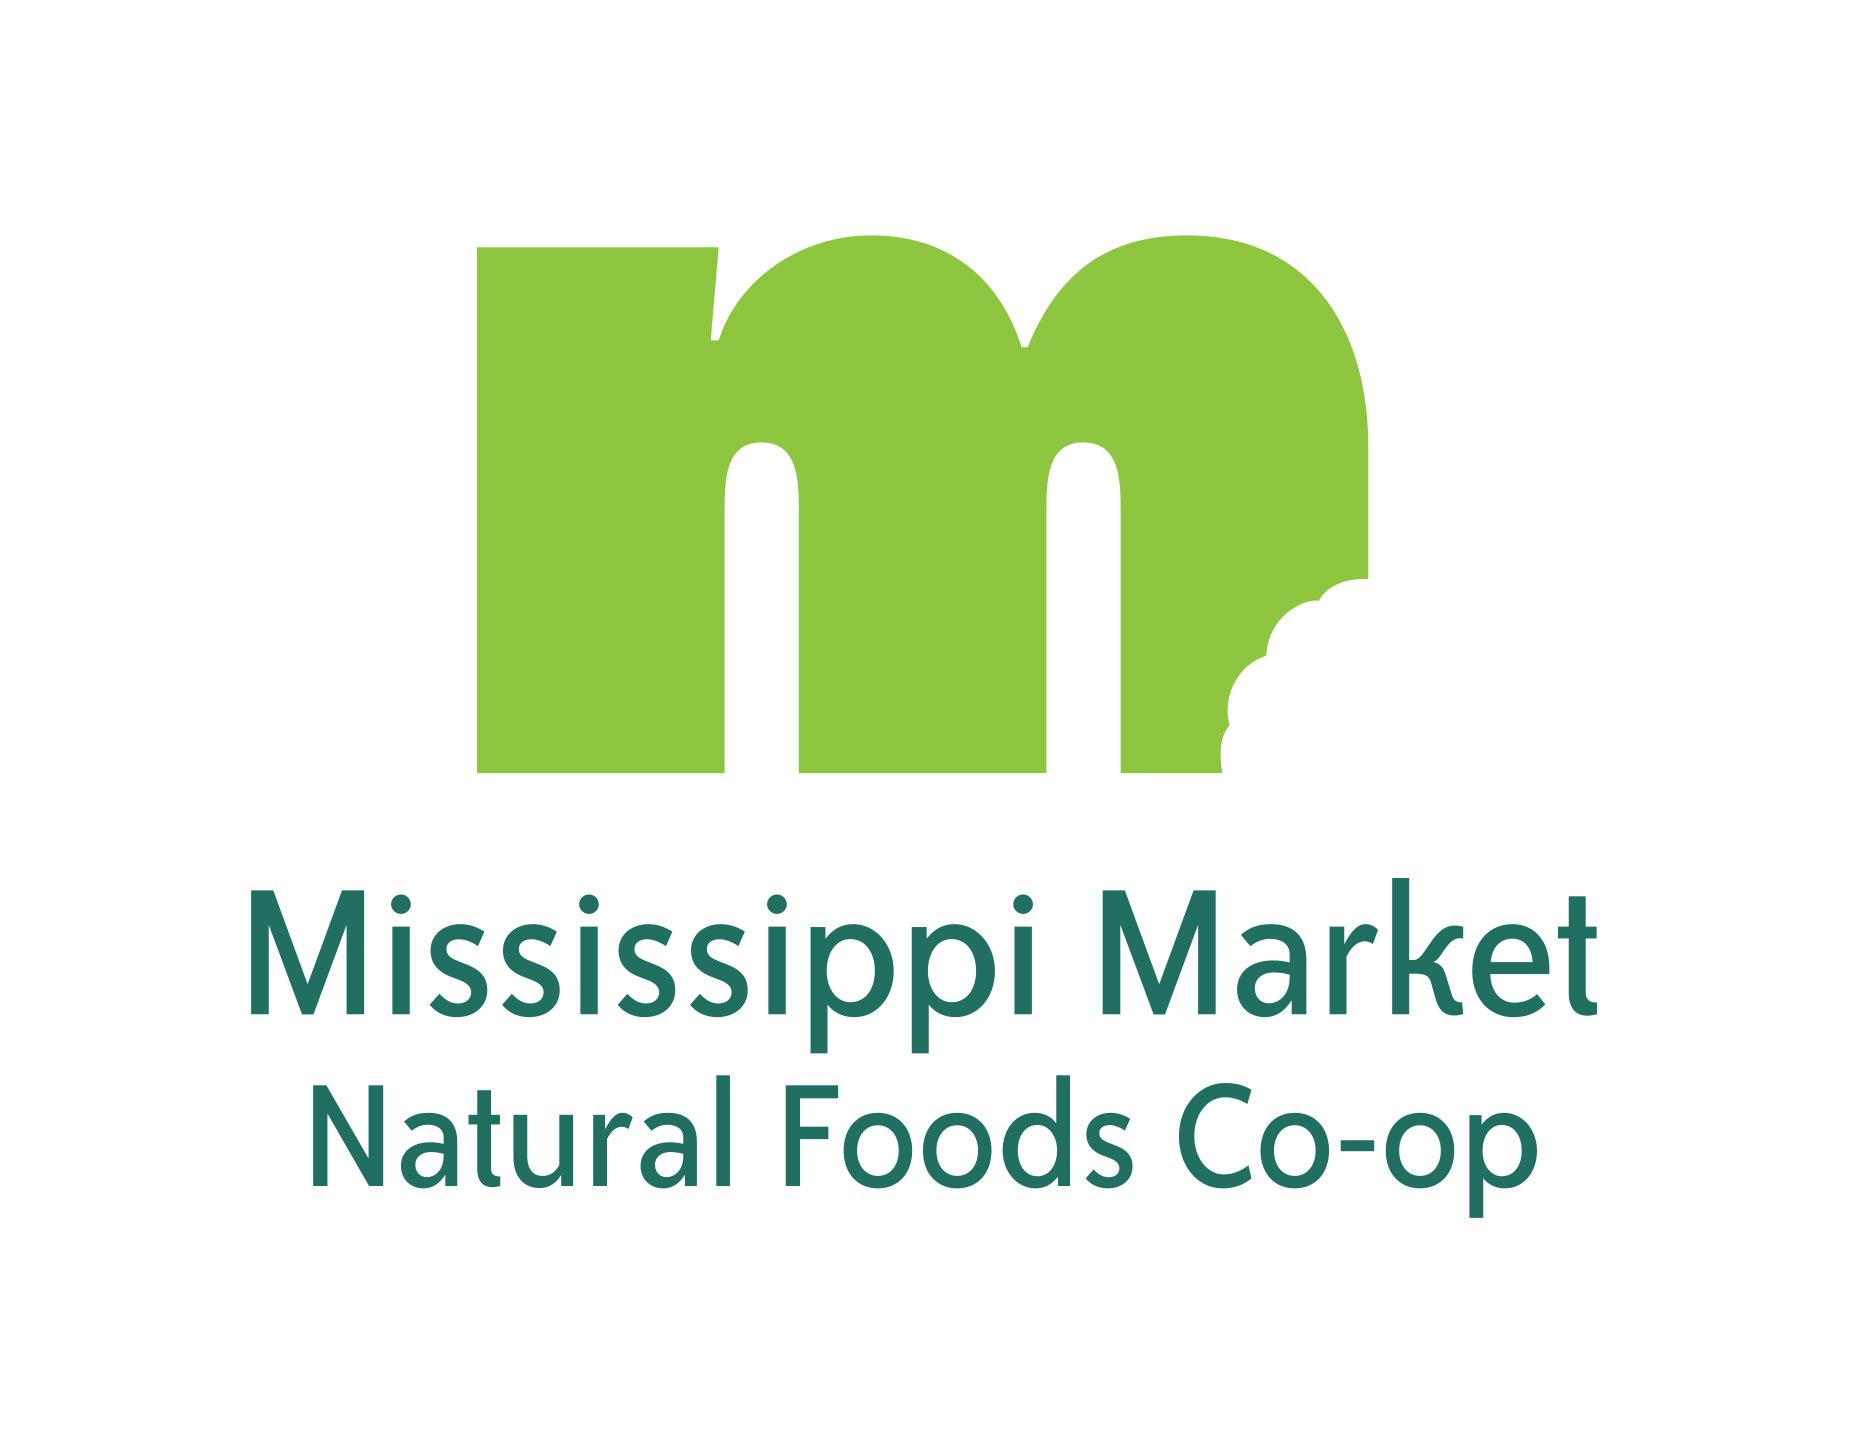 MS_Market.jpg